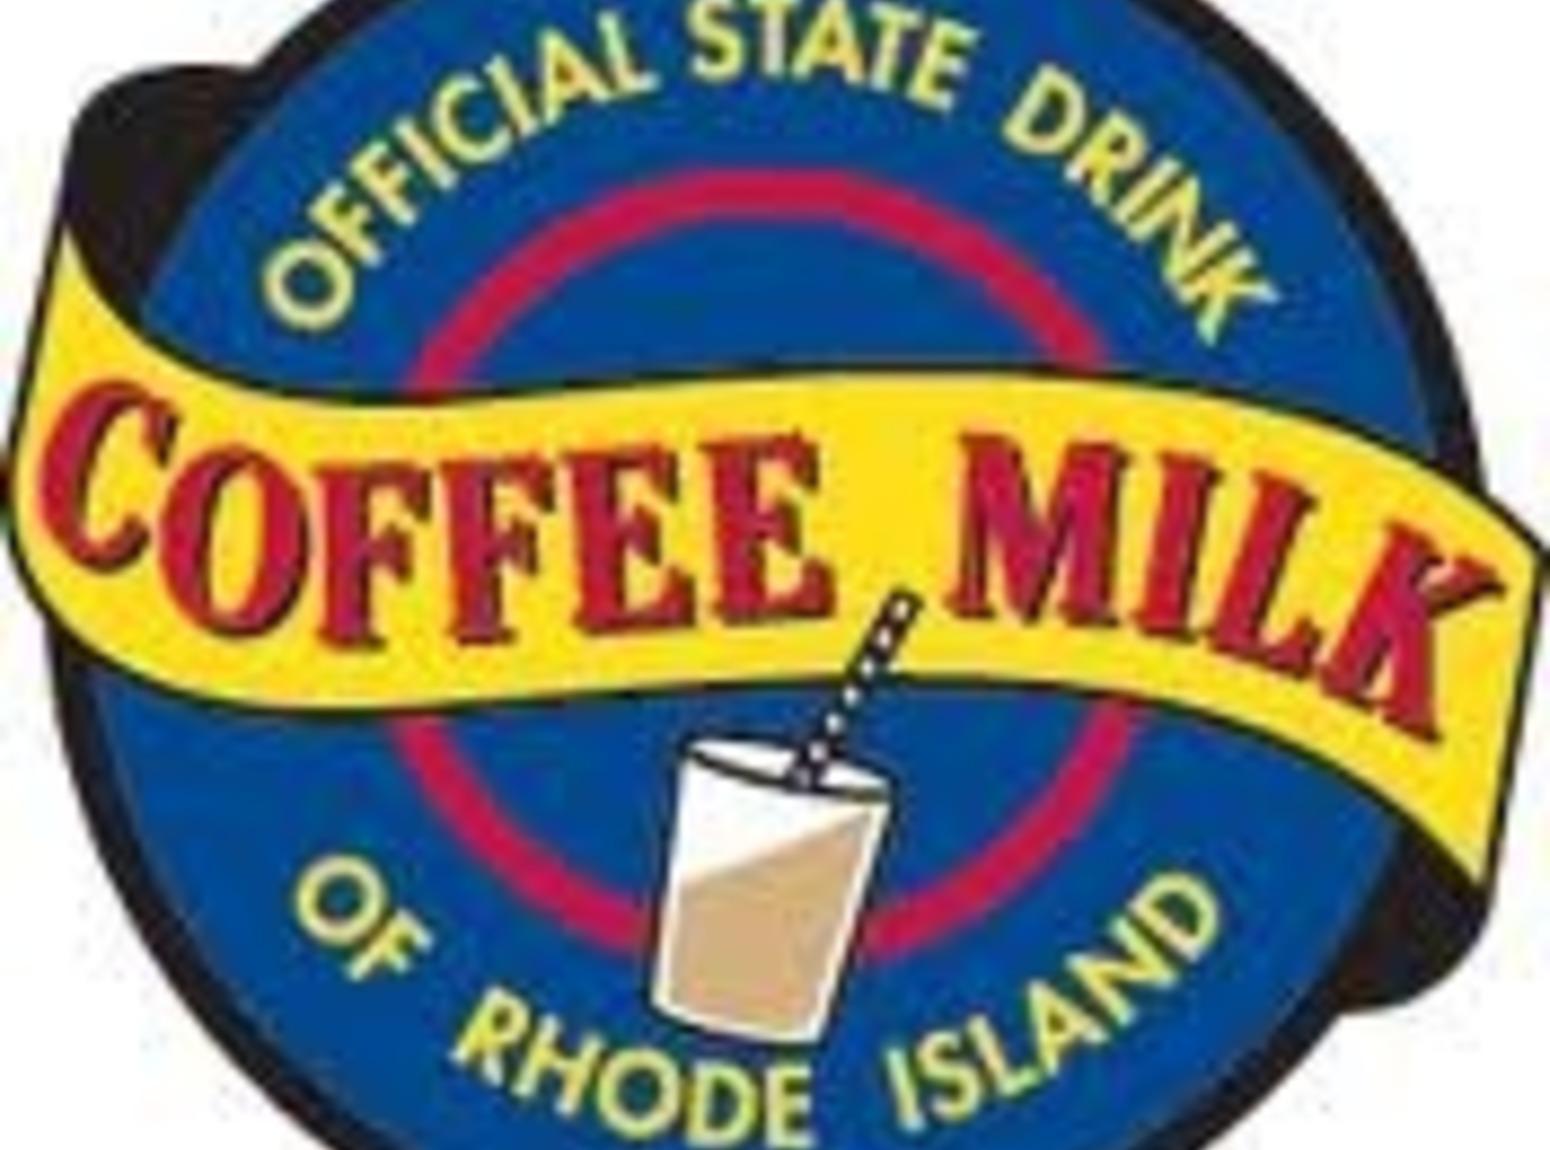 R.I. Coffee Milk or Coffee Milkshake Recipe | Just A Pinch ...